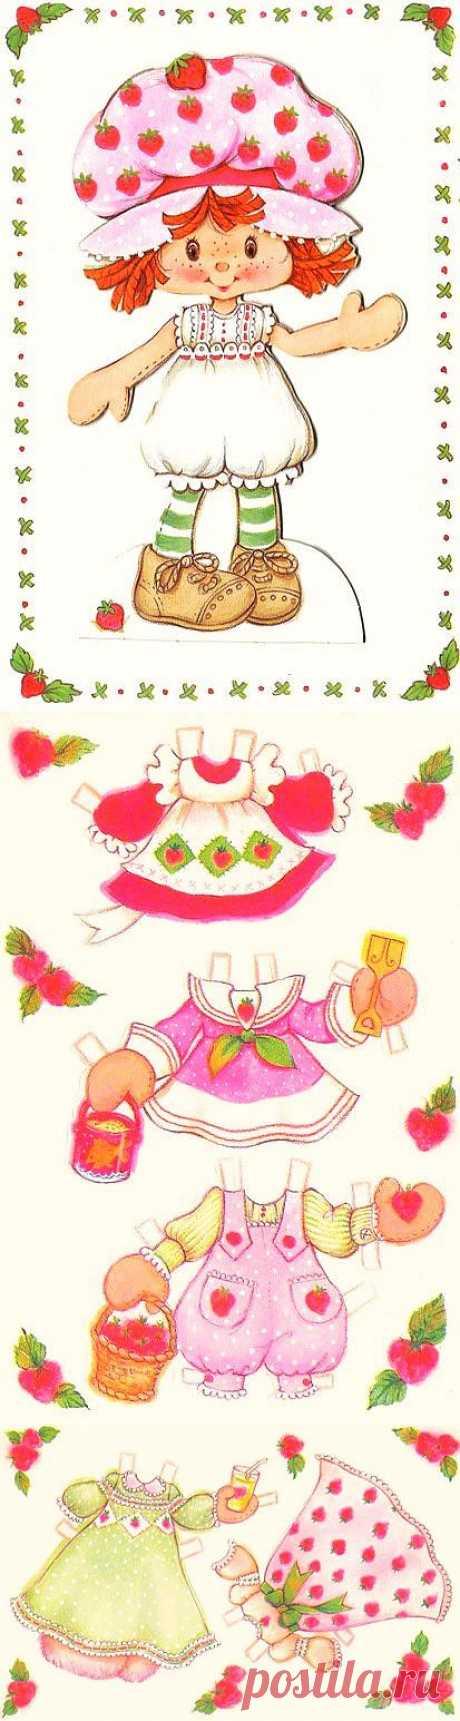 Boneca de papel / Paper doll | Flickr - Photo Sharing!